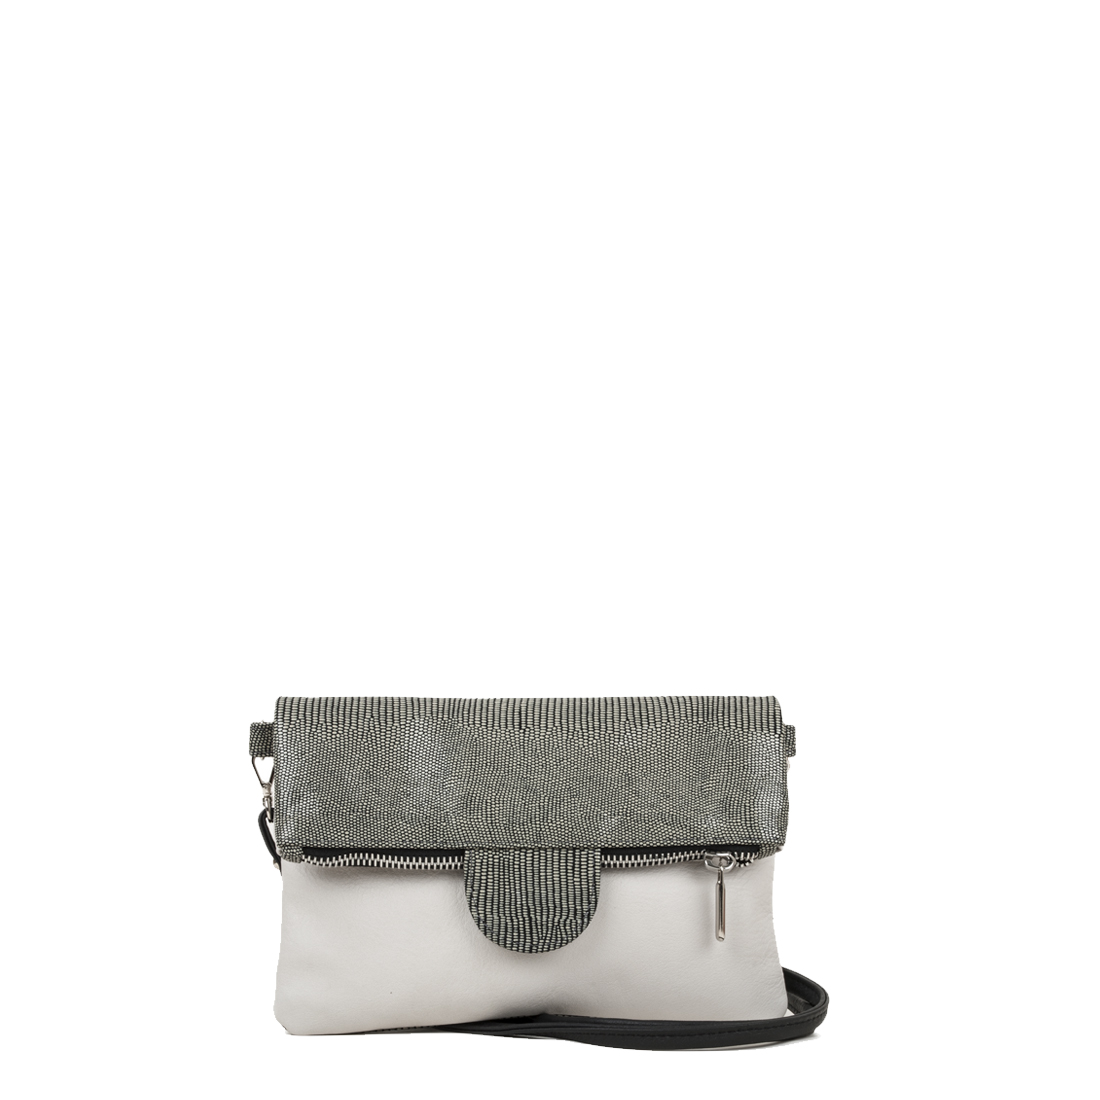 Lilly Polvere Across Body Bag